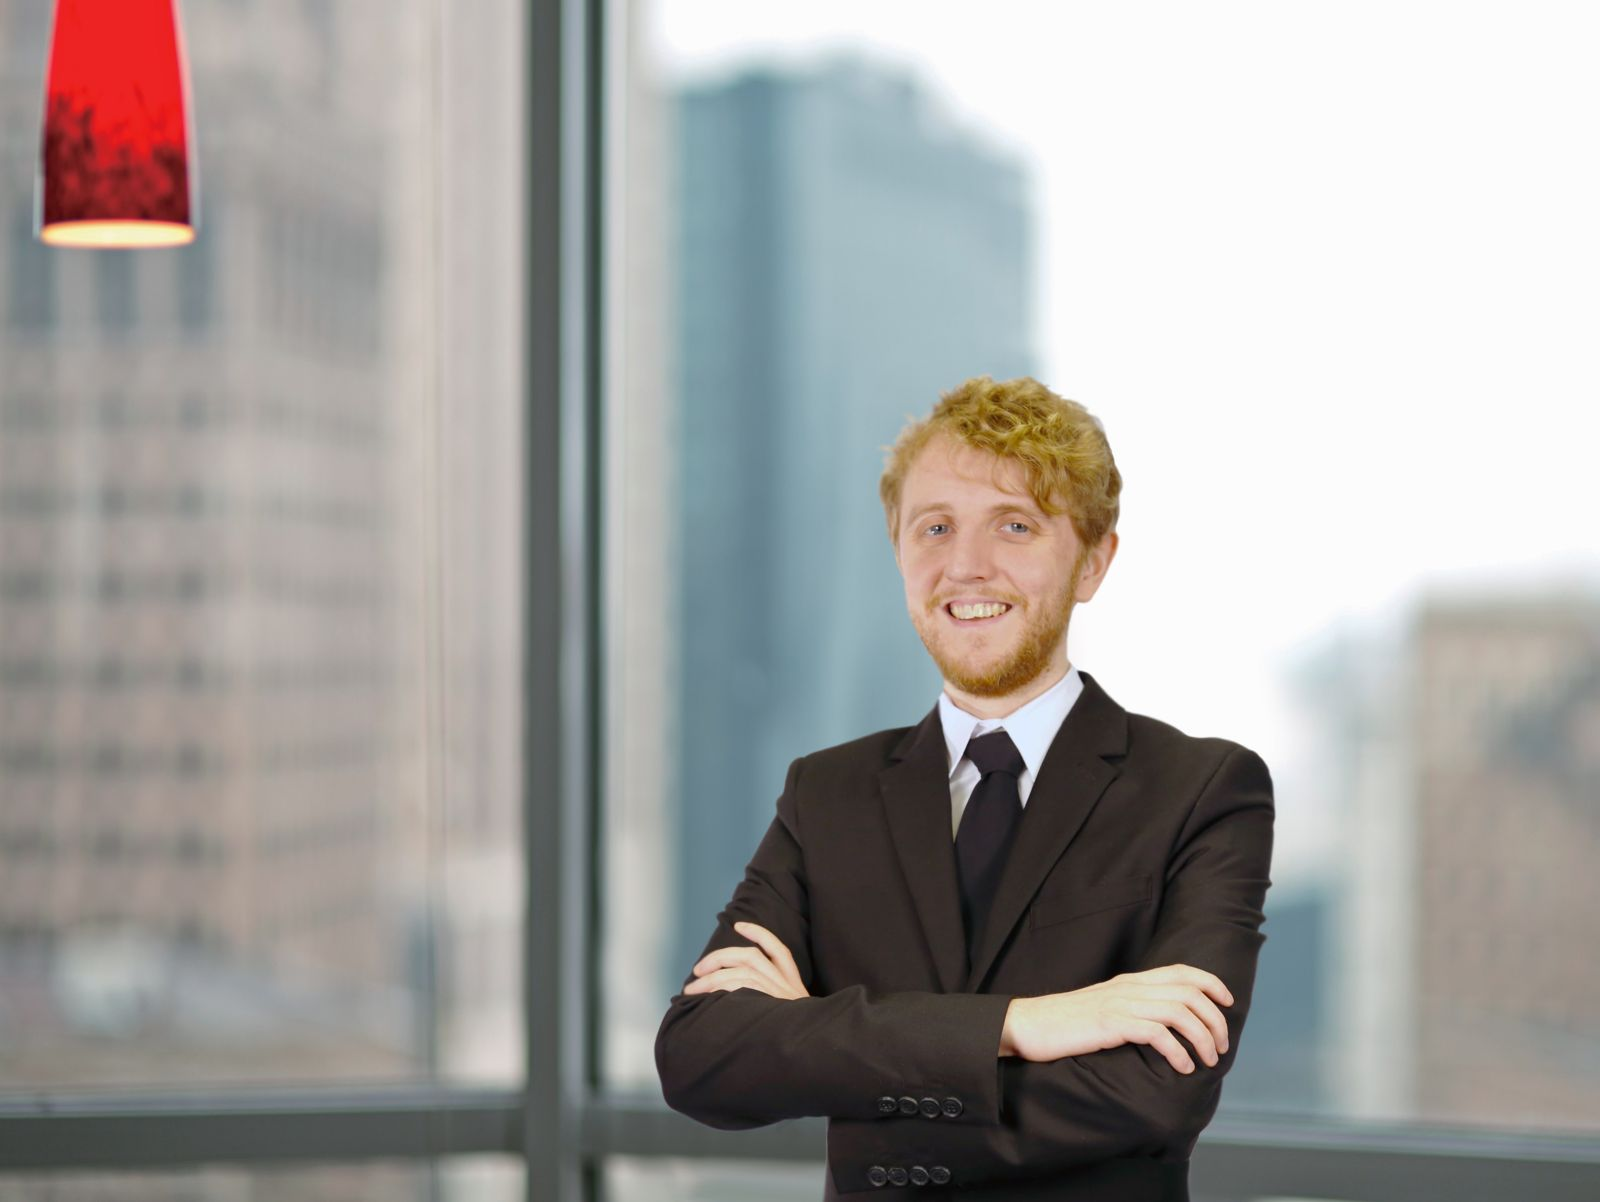 Attorney Ryan Truesdale